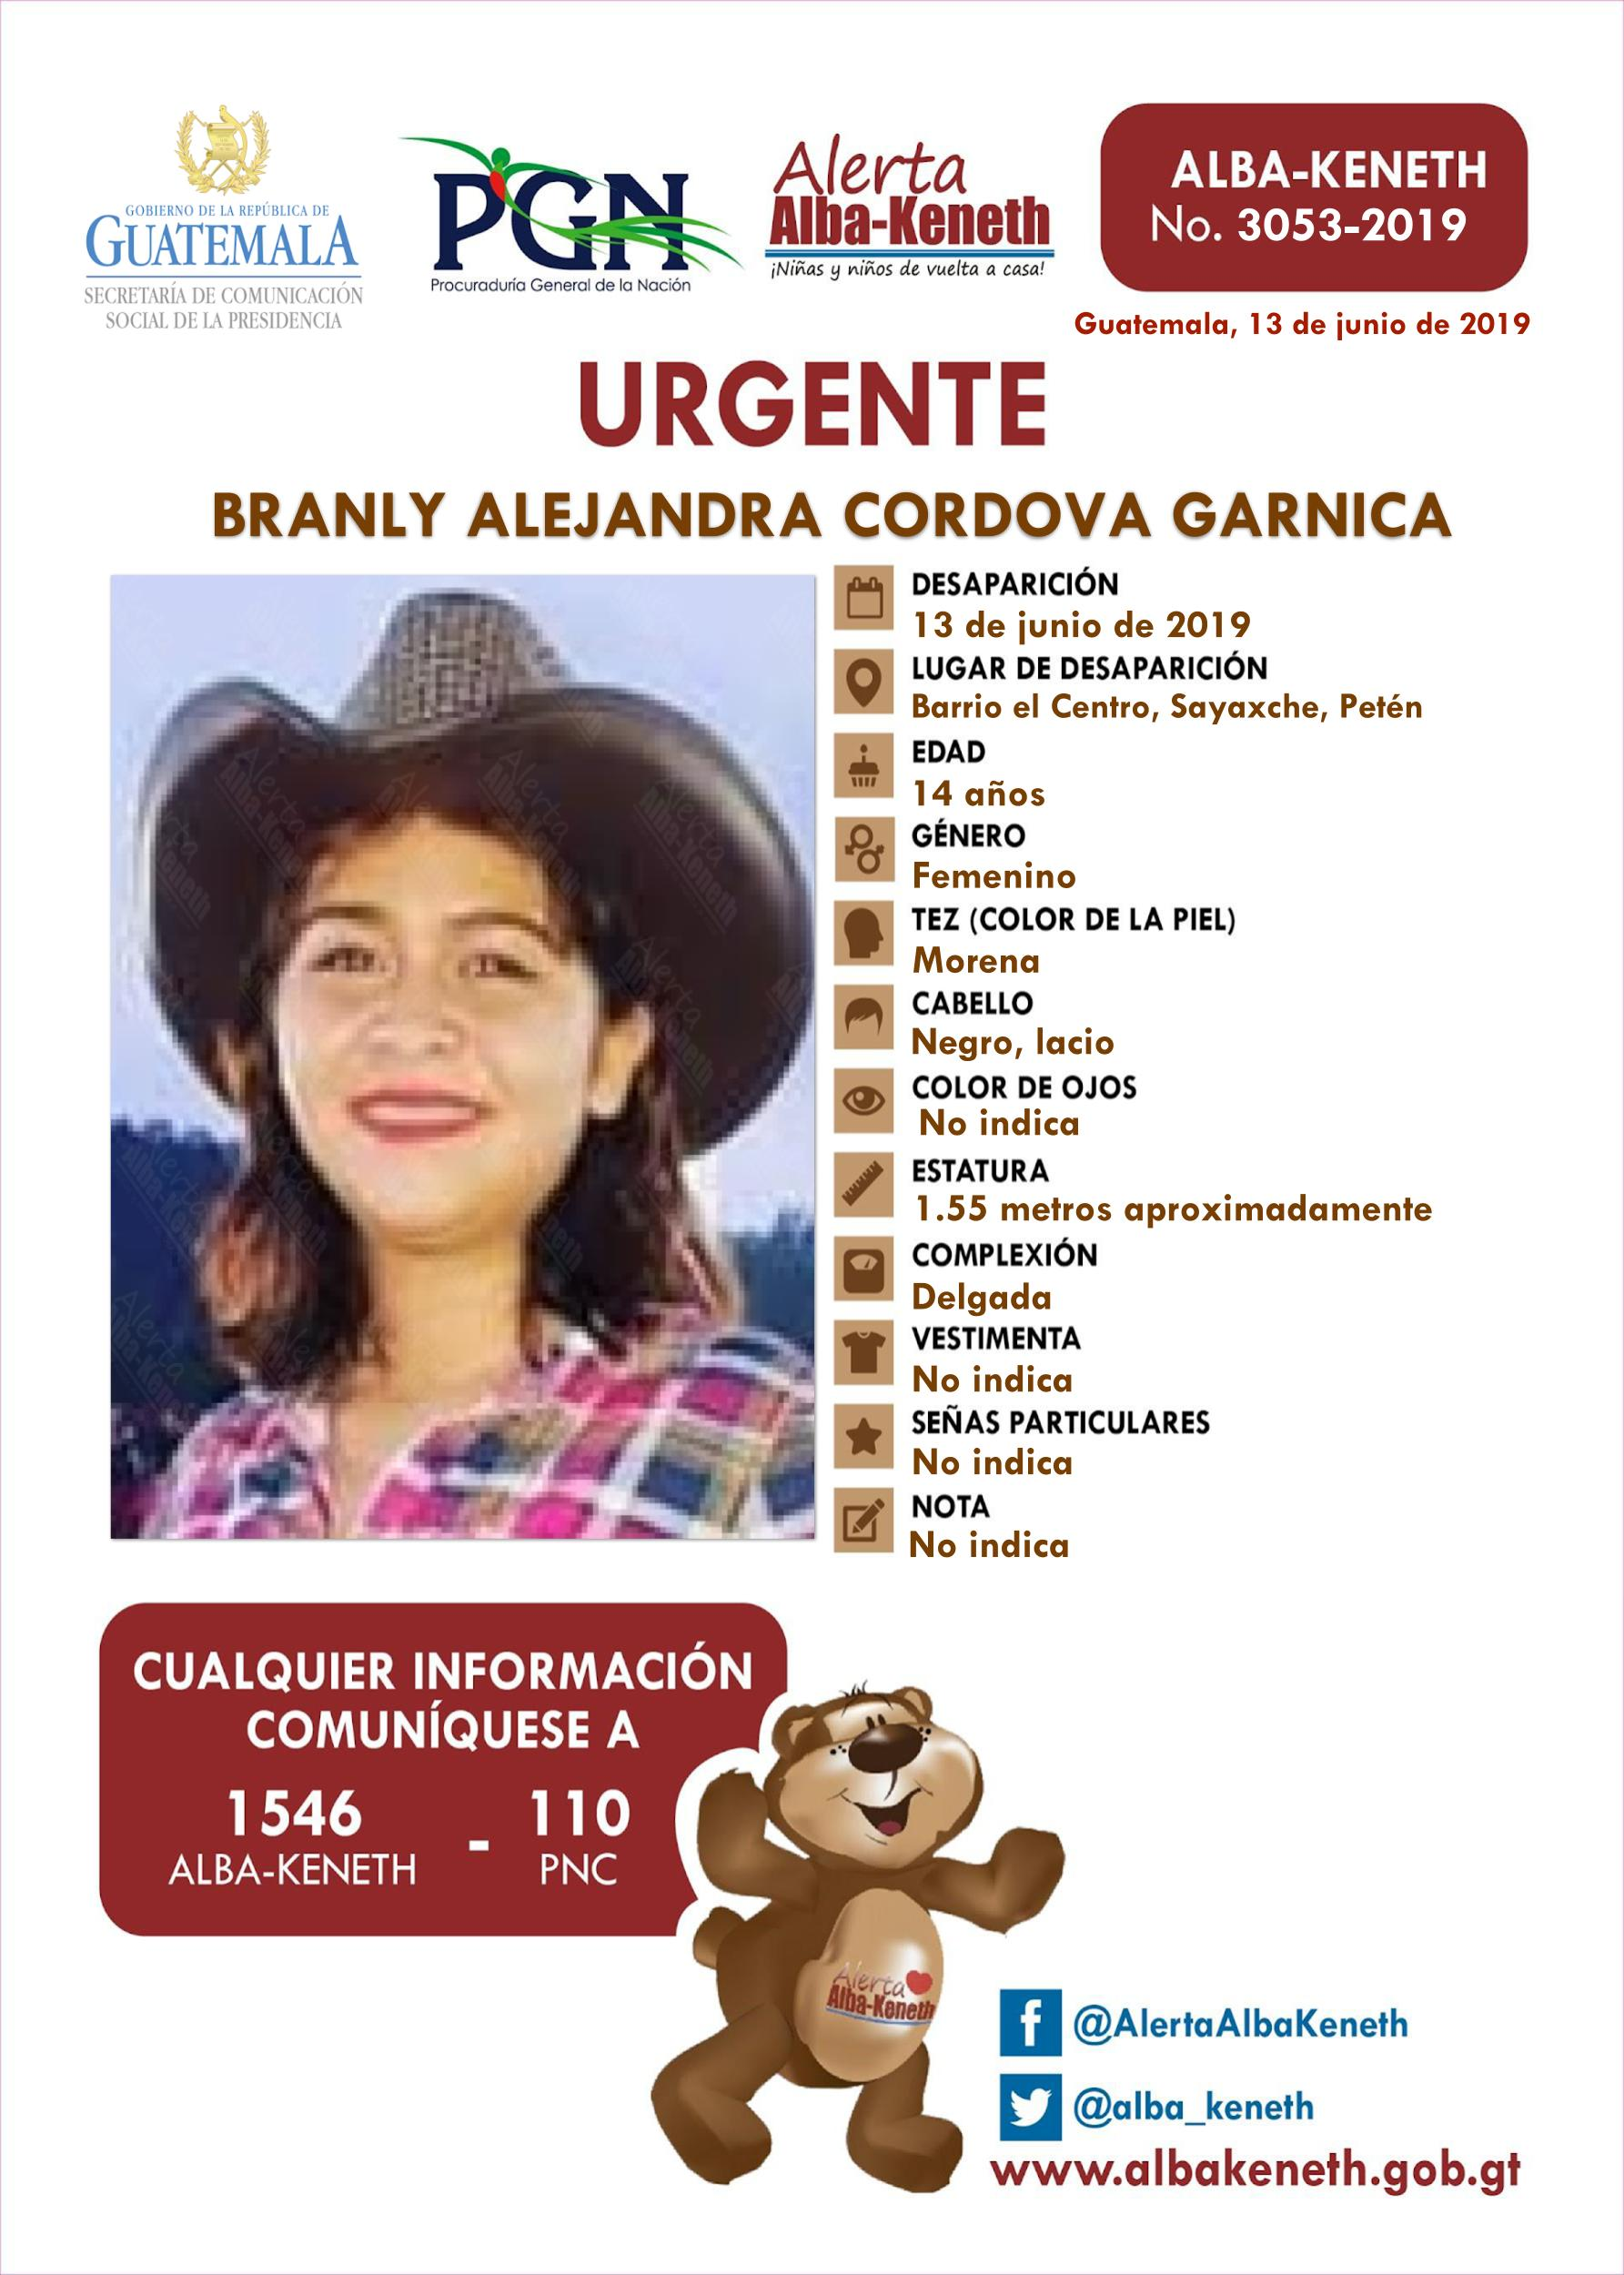 Branly Alejandra Cordova Garnica